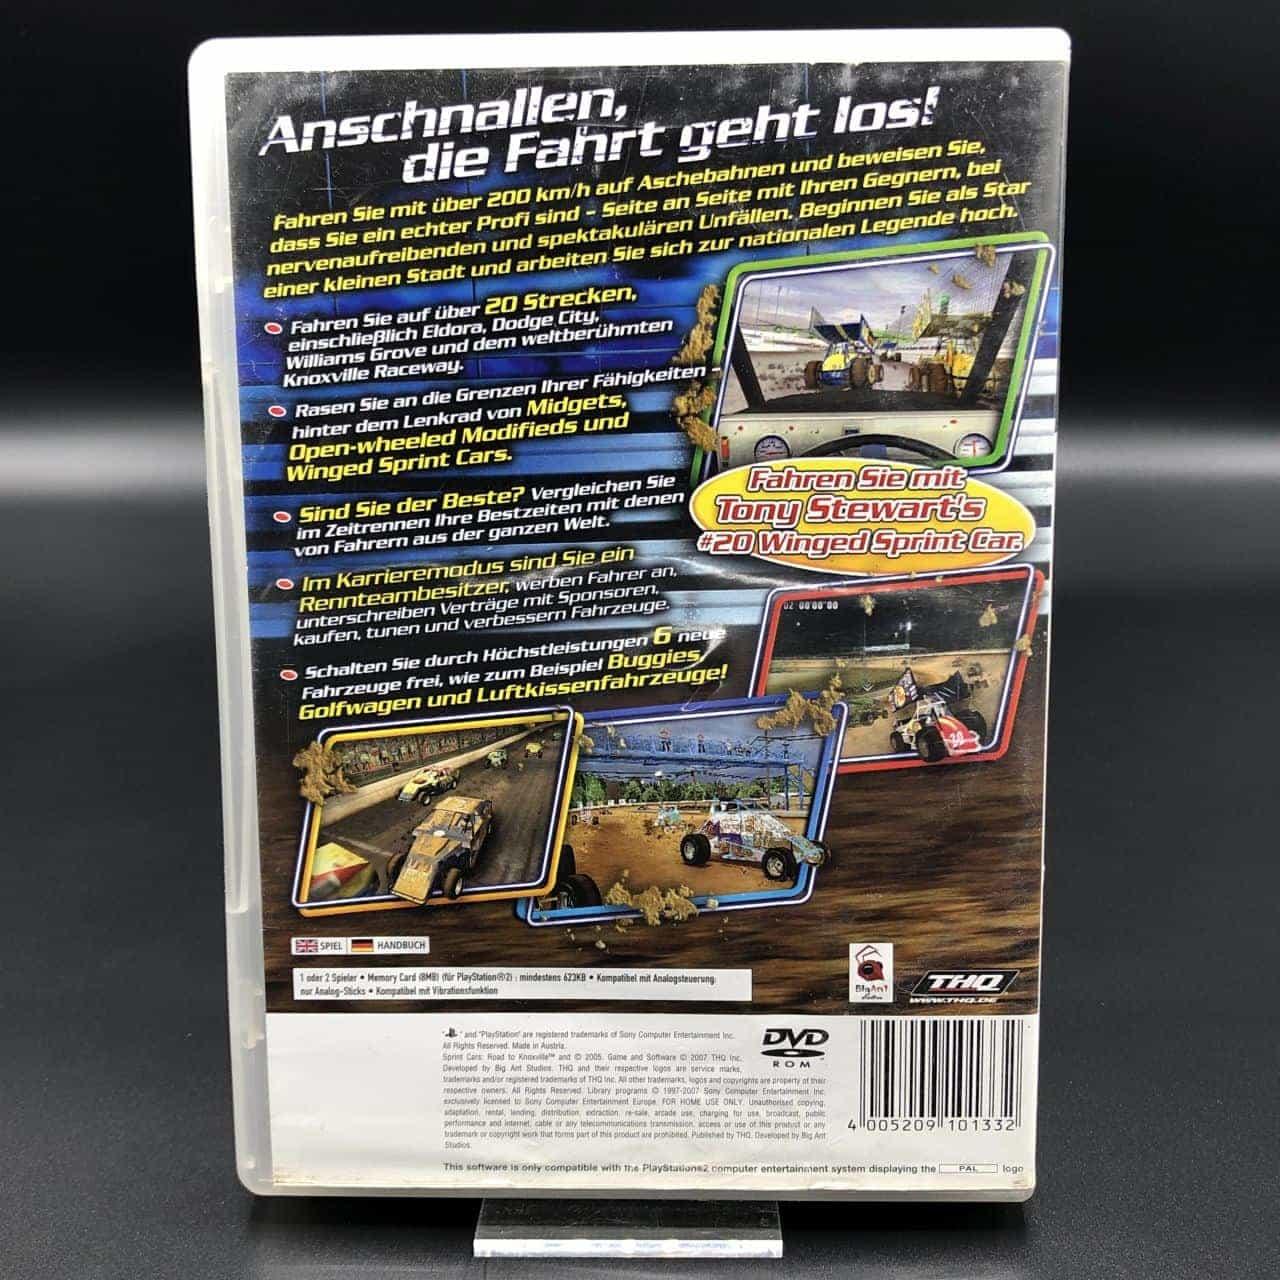 PS2 Sprint Cars: Road to Knoxville (Komplett) (Gebrauchsspuren) Sony PlayStation 2